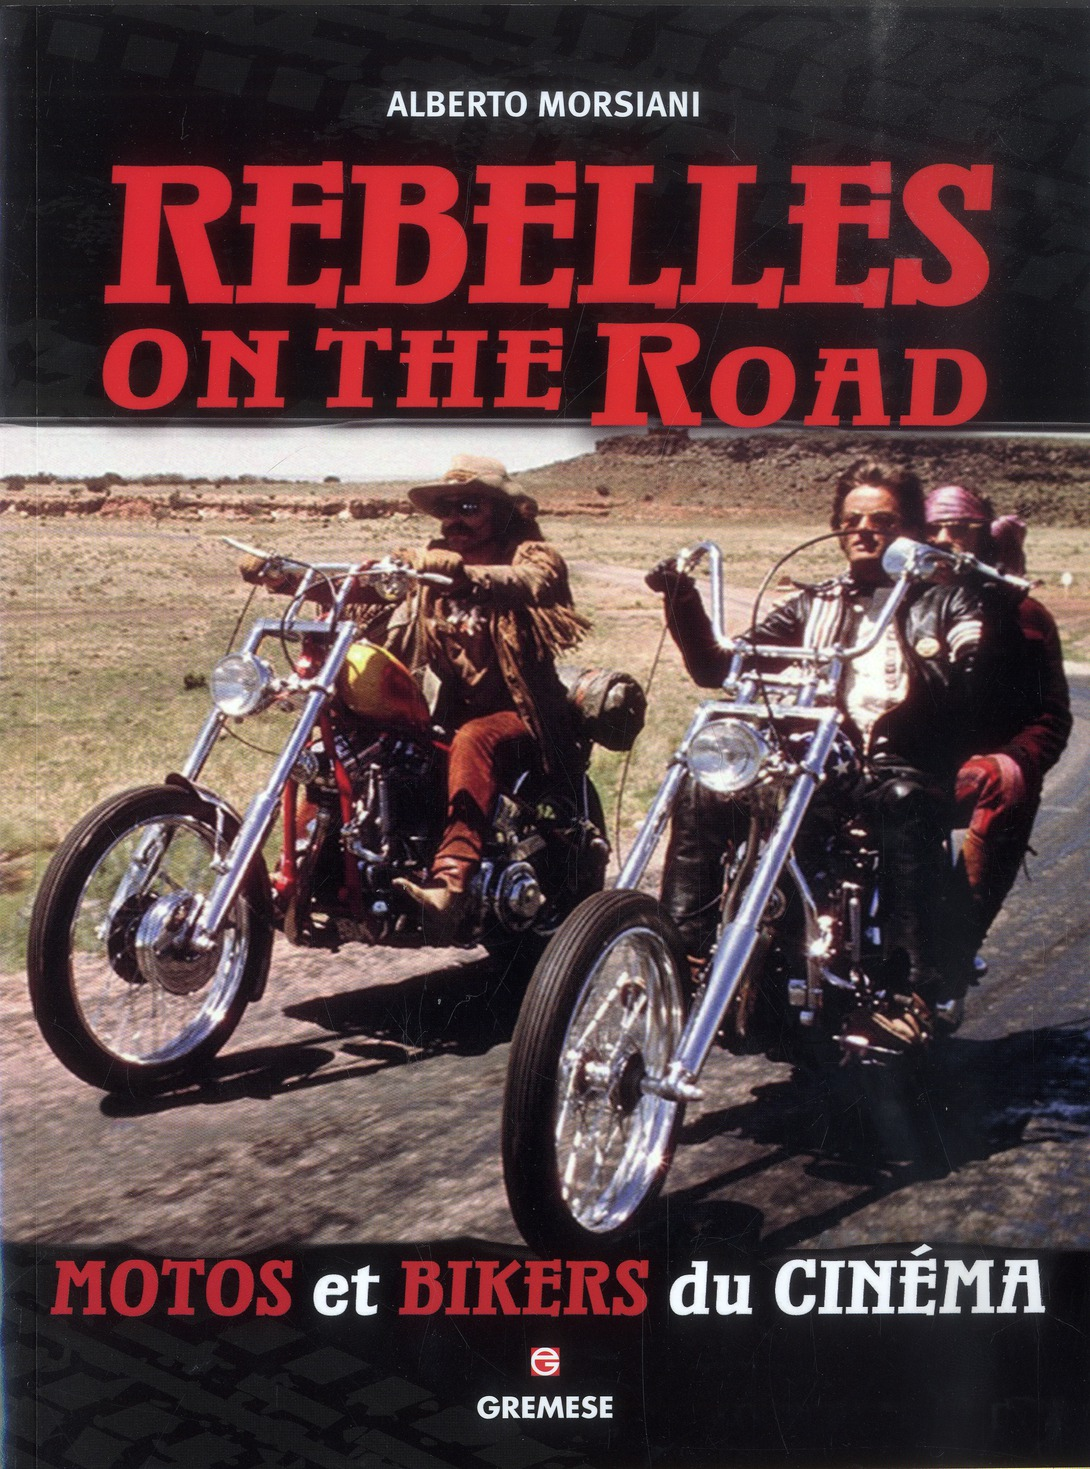 REBELLES ON THE ROAD MOTOS ET BIKERS DU CINEMA